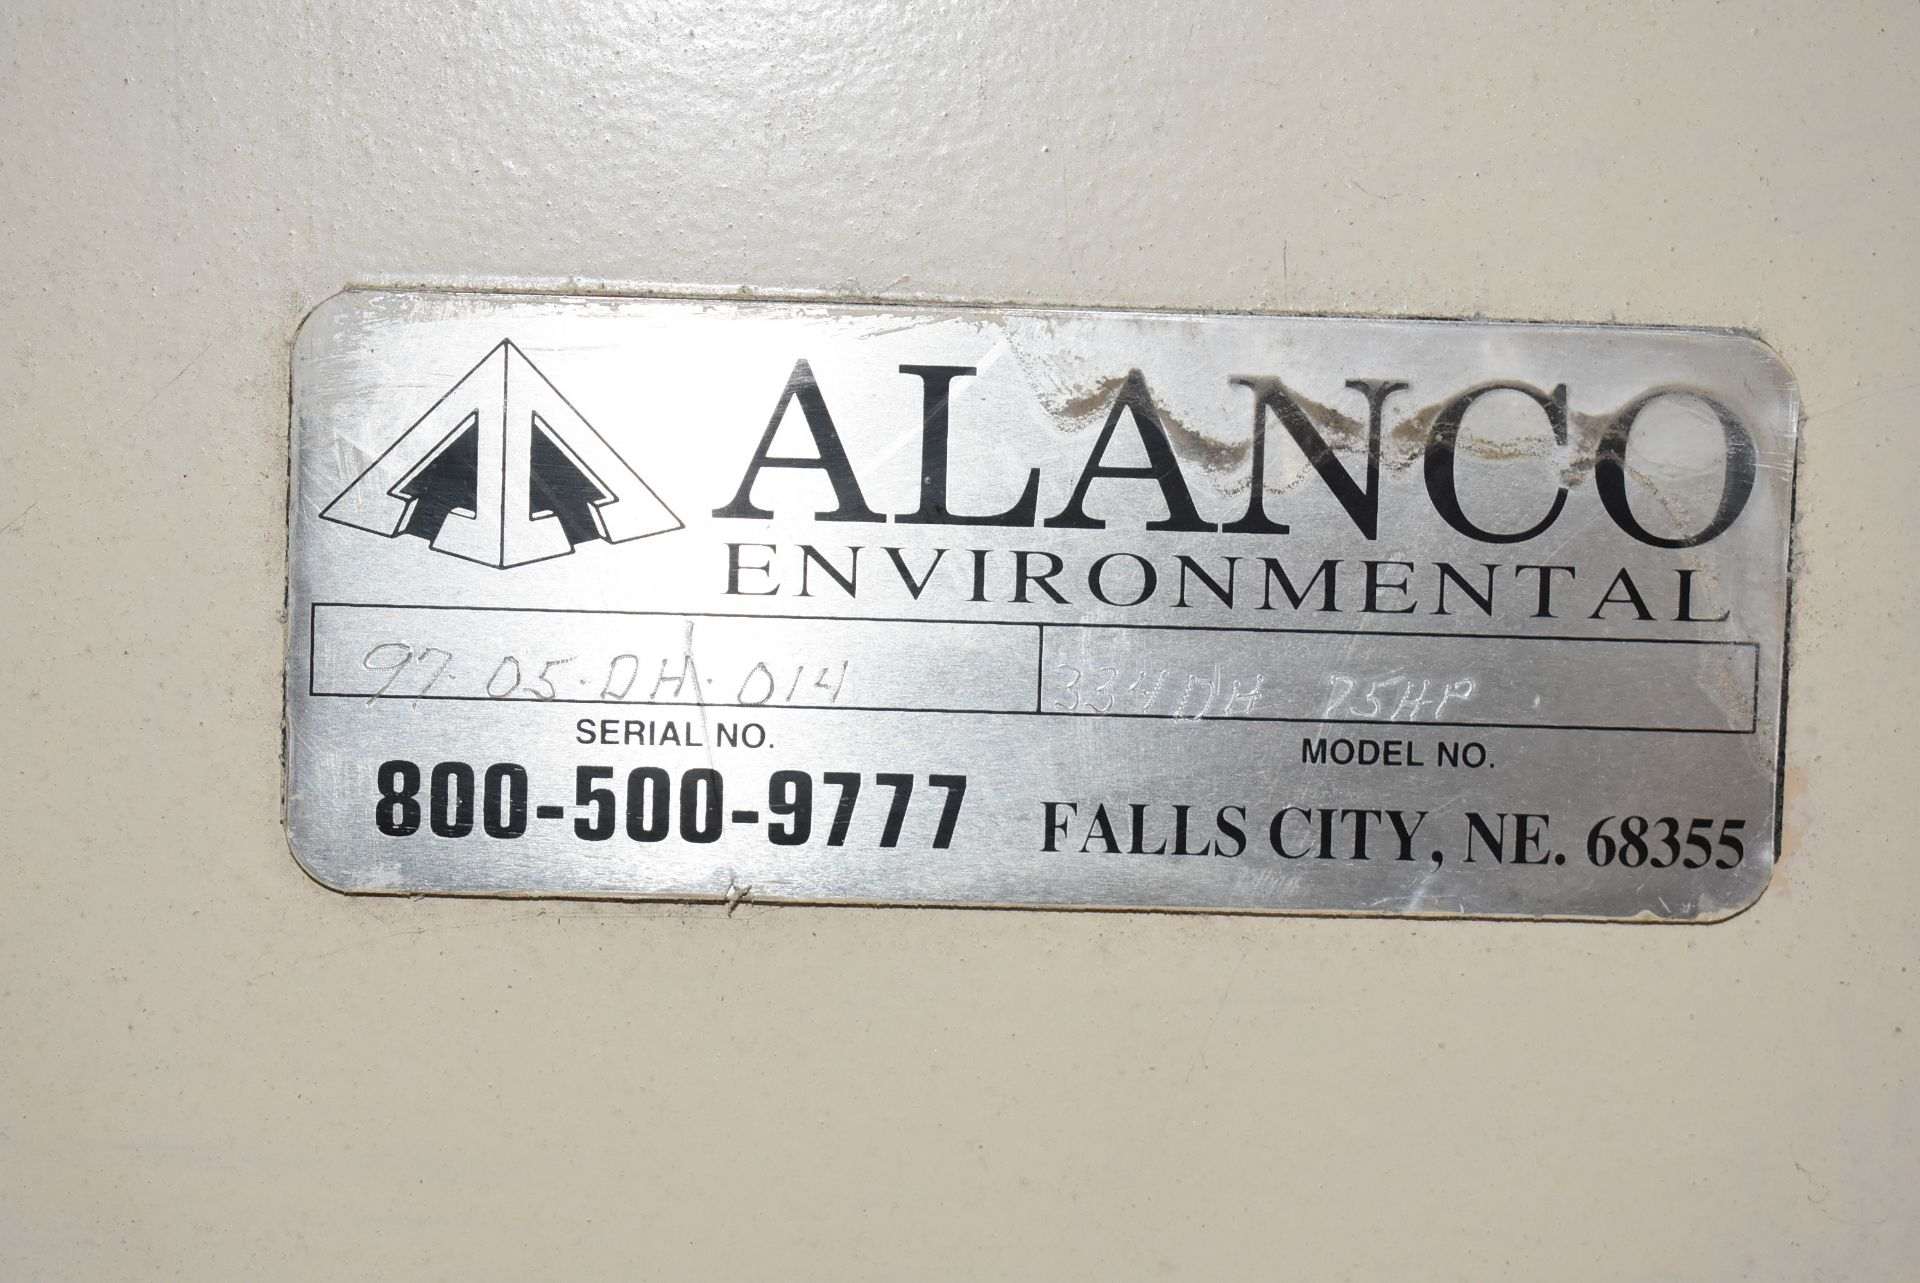 Alanco Environmental Model #334DH Blower w/50 HP Motor - Image 3 of 4